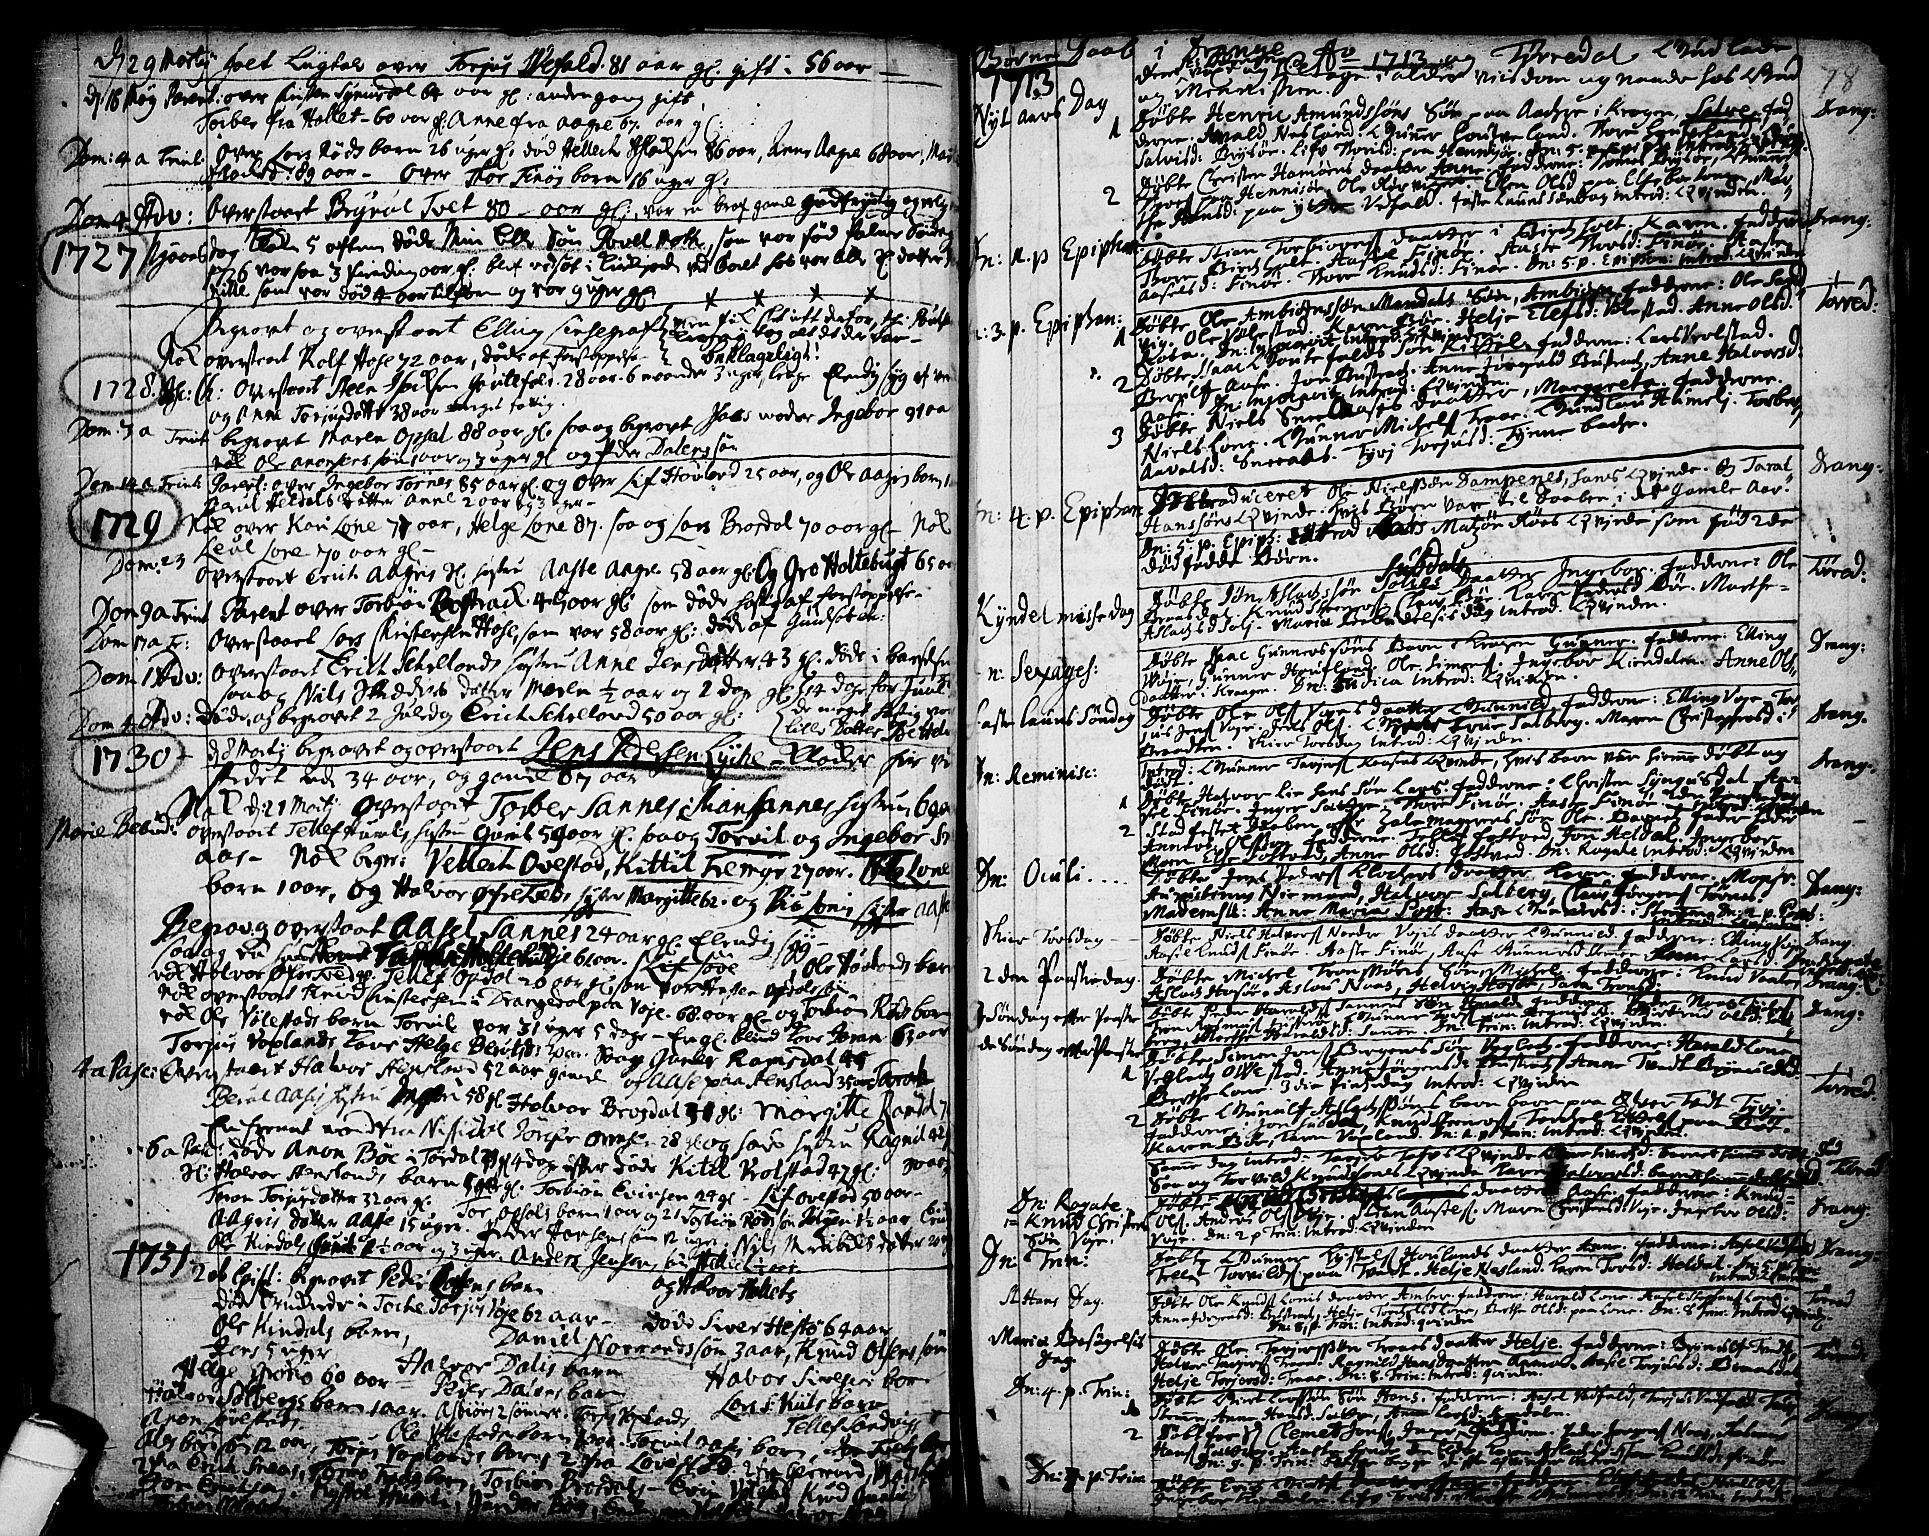 SAKO, Drangedal kirkebøker, F/Fa/L0001: Ministerialbok nr. 1, 1697-1767, s. 78